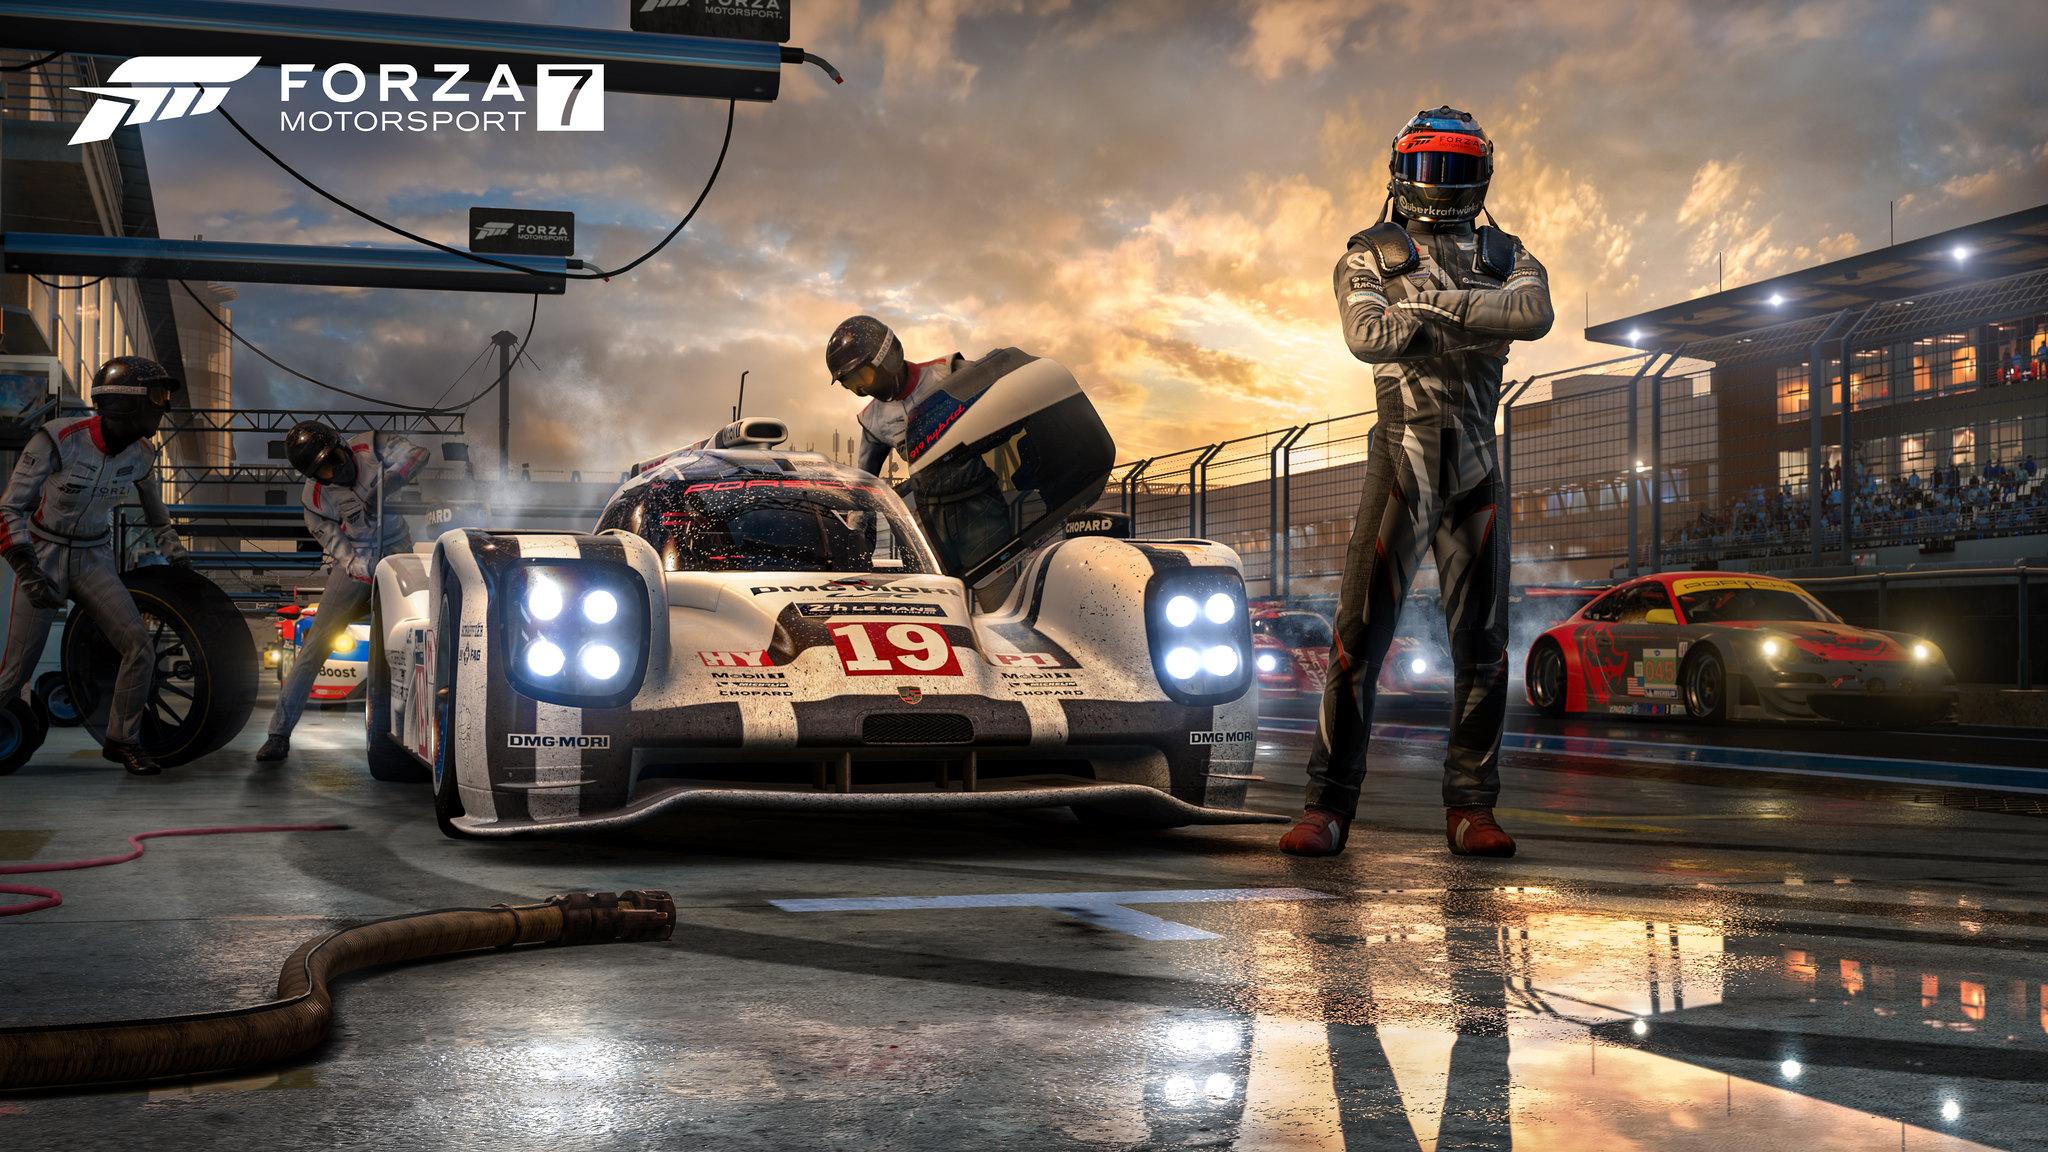 Forza7_E3_PressKit_PitCrew_01_WM_4K